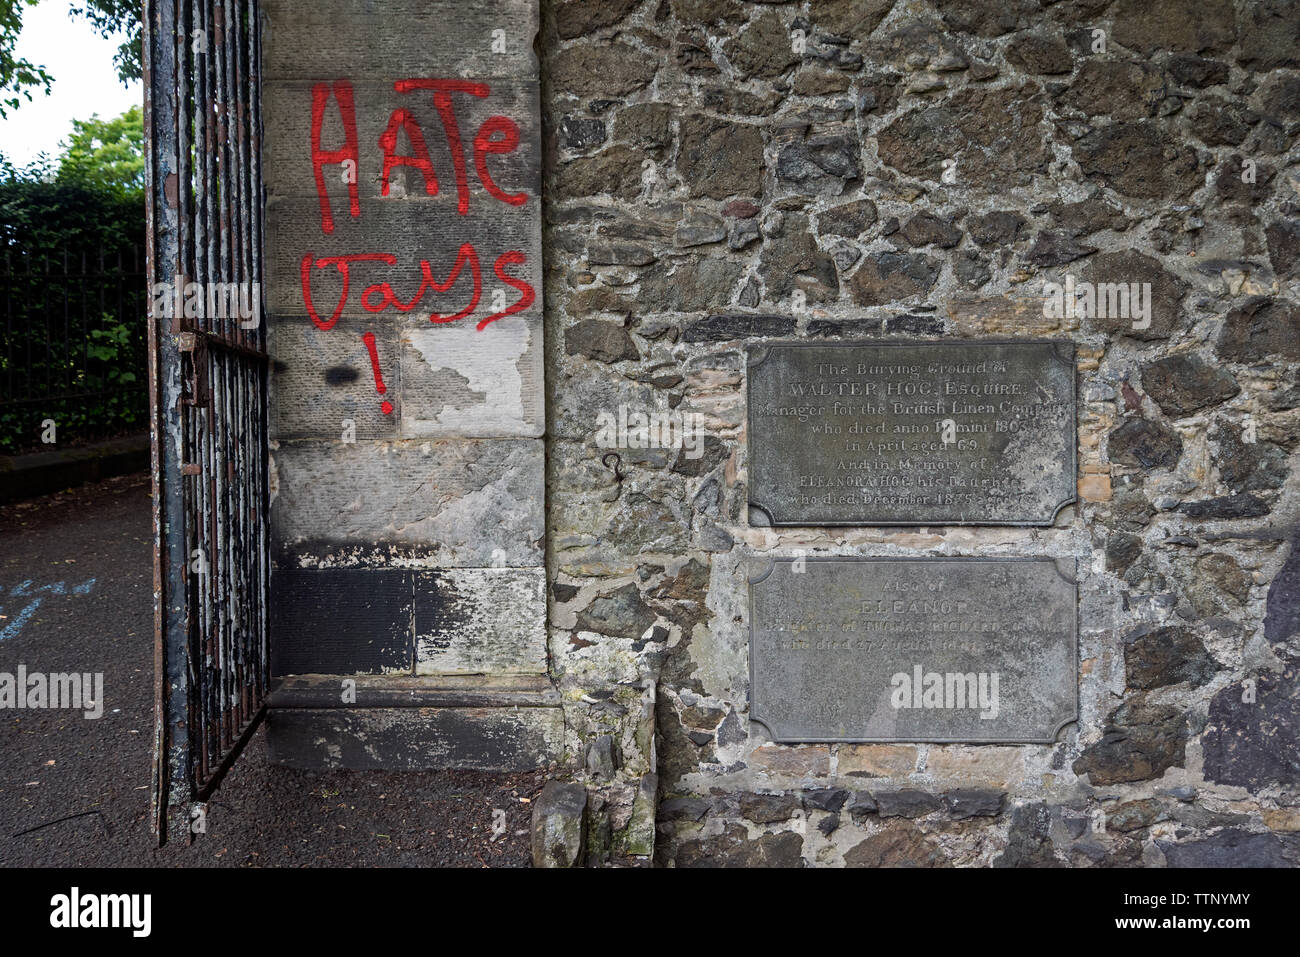 Homophobic graffiti painted on tombs in New Calton Burial Ground, Edinburgh, Scotland, UK. June 2019. - Stock Image